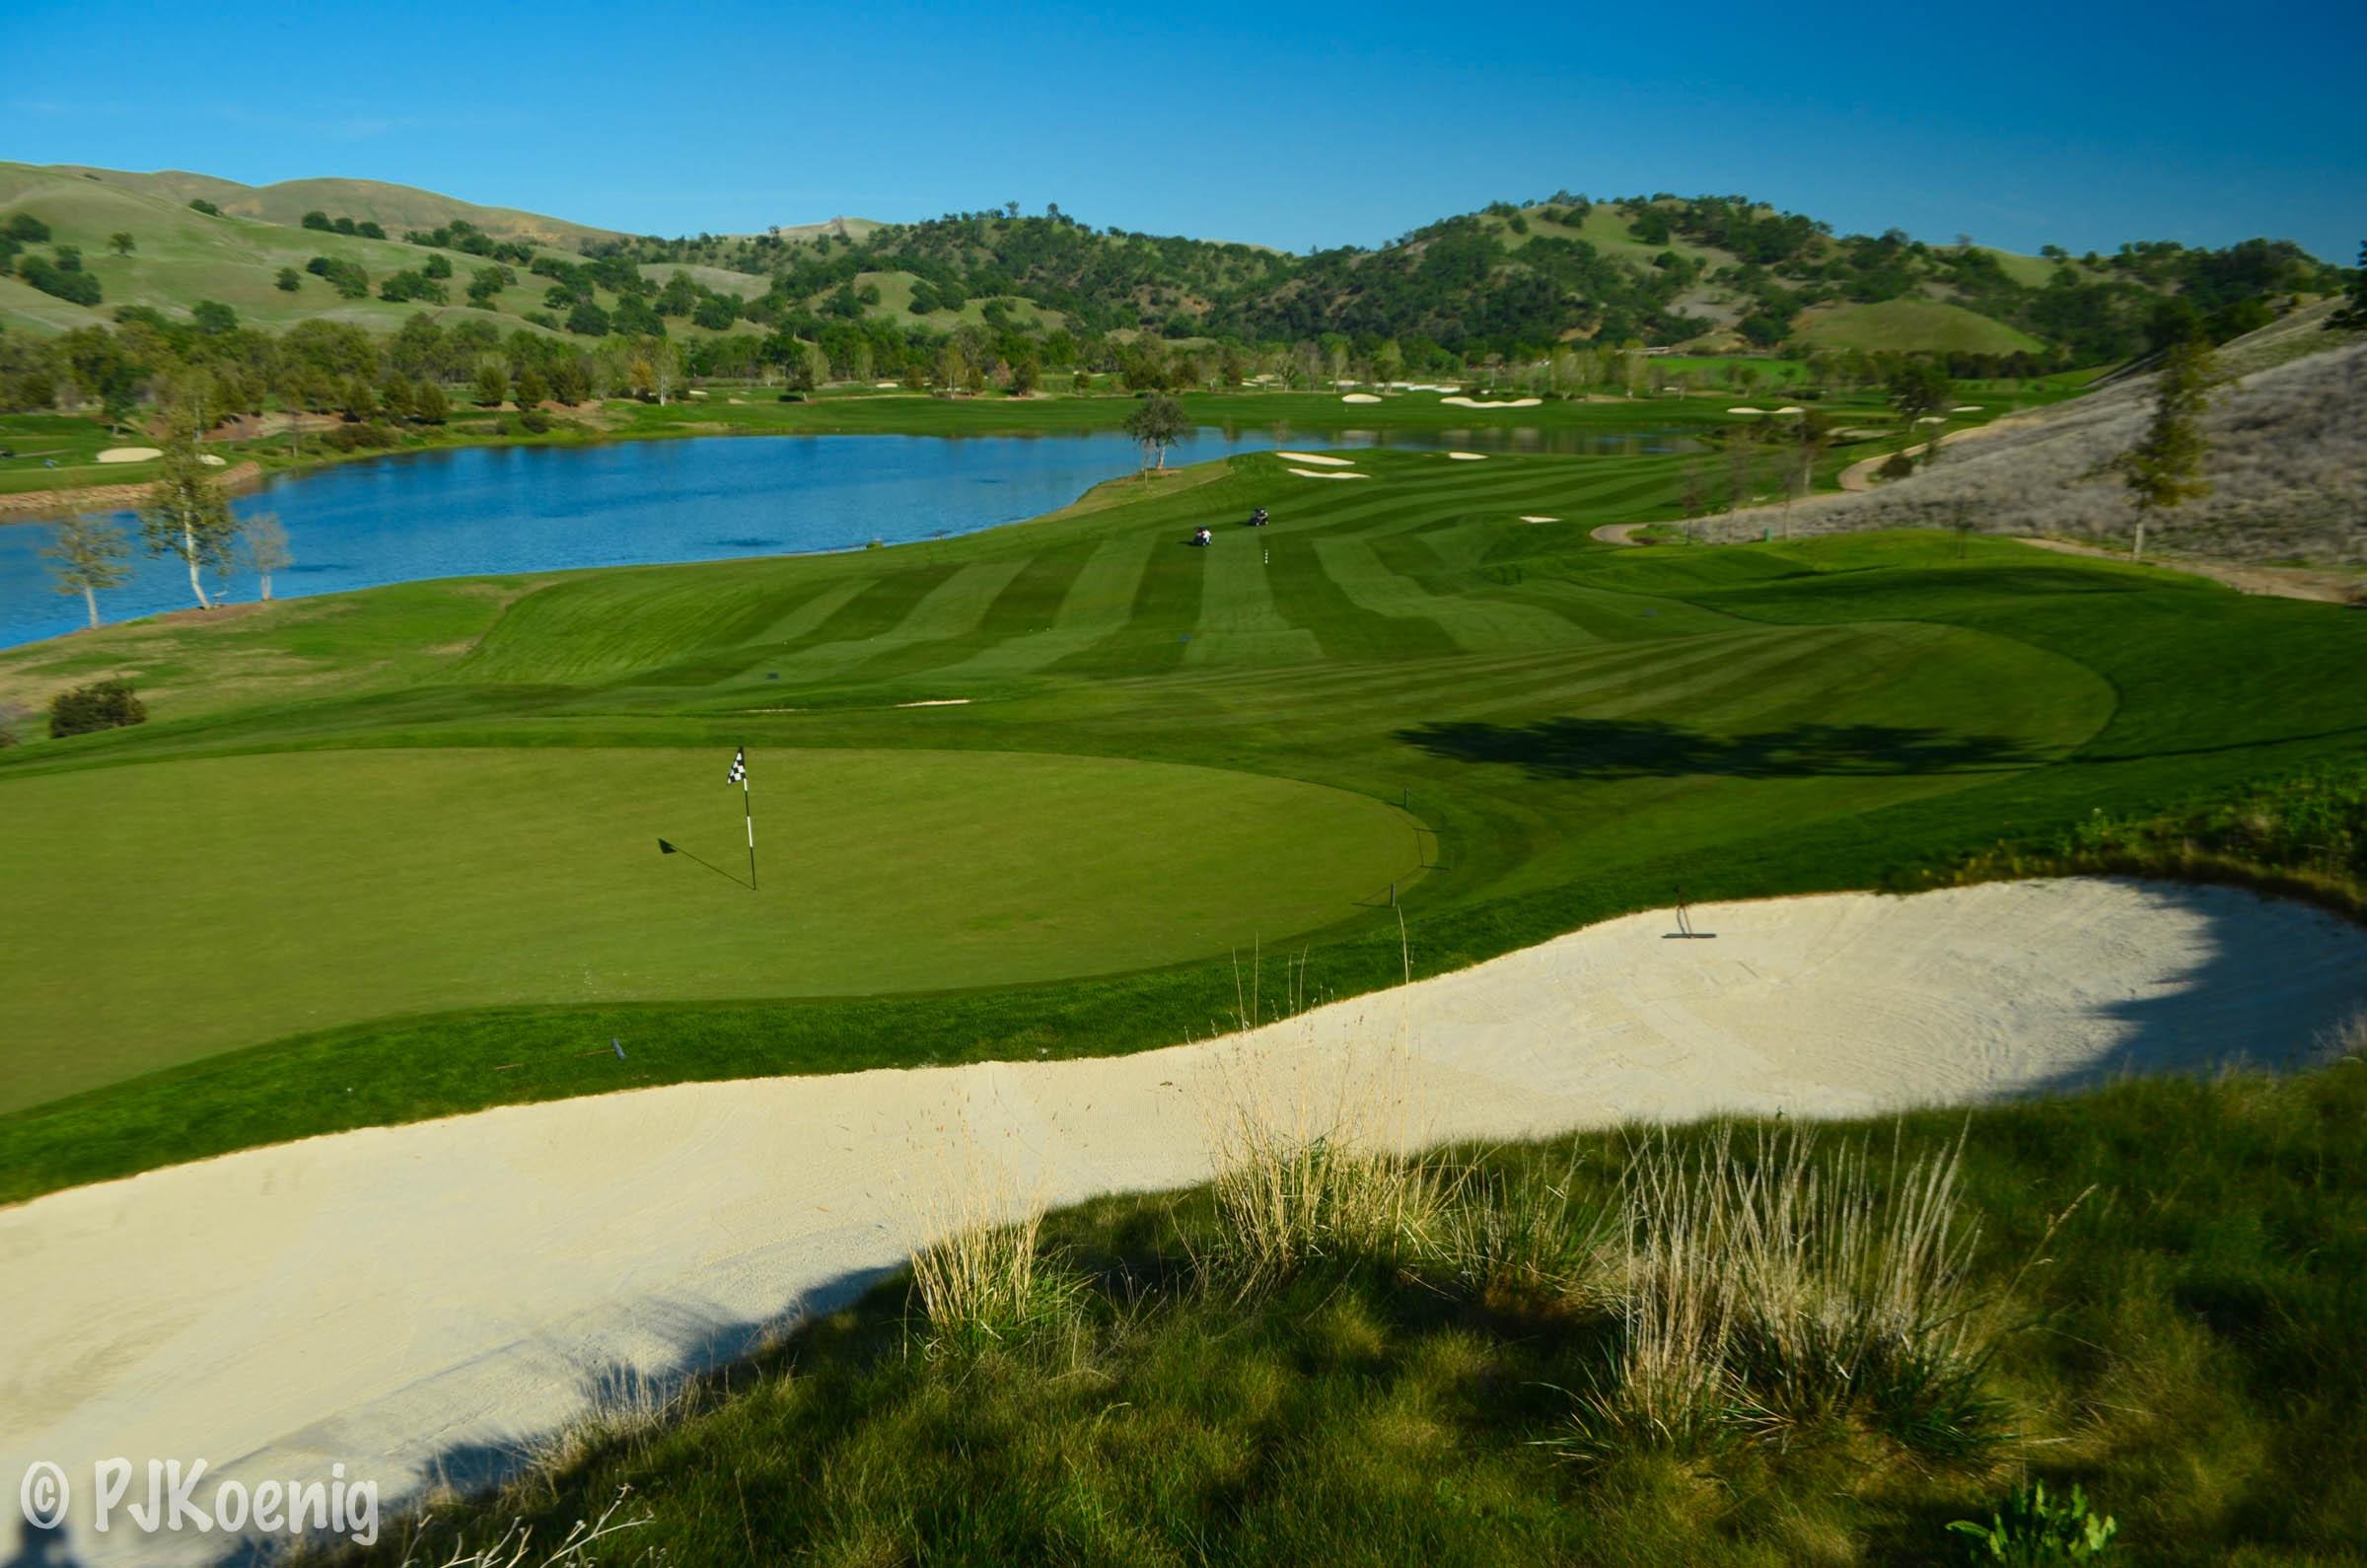 Yocha Dehe Golf Club - Brooks, CA